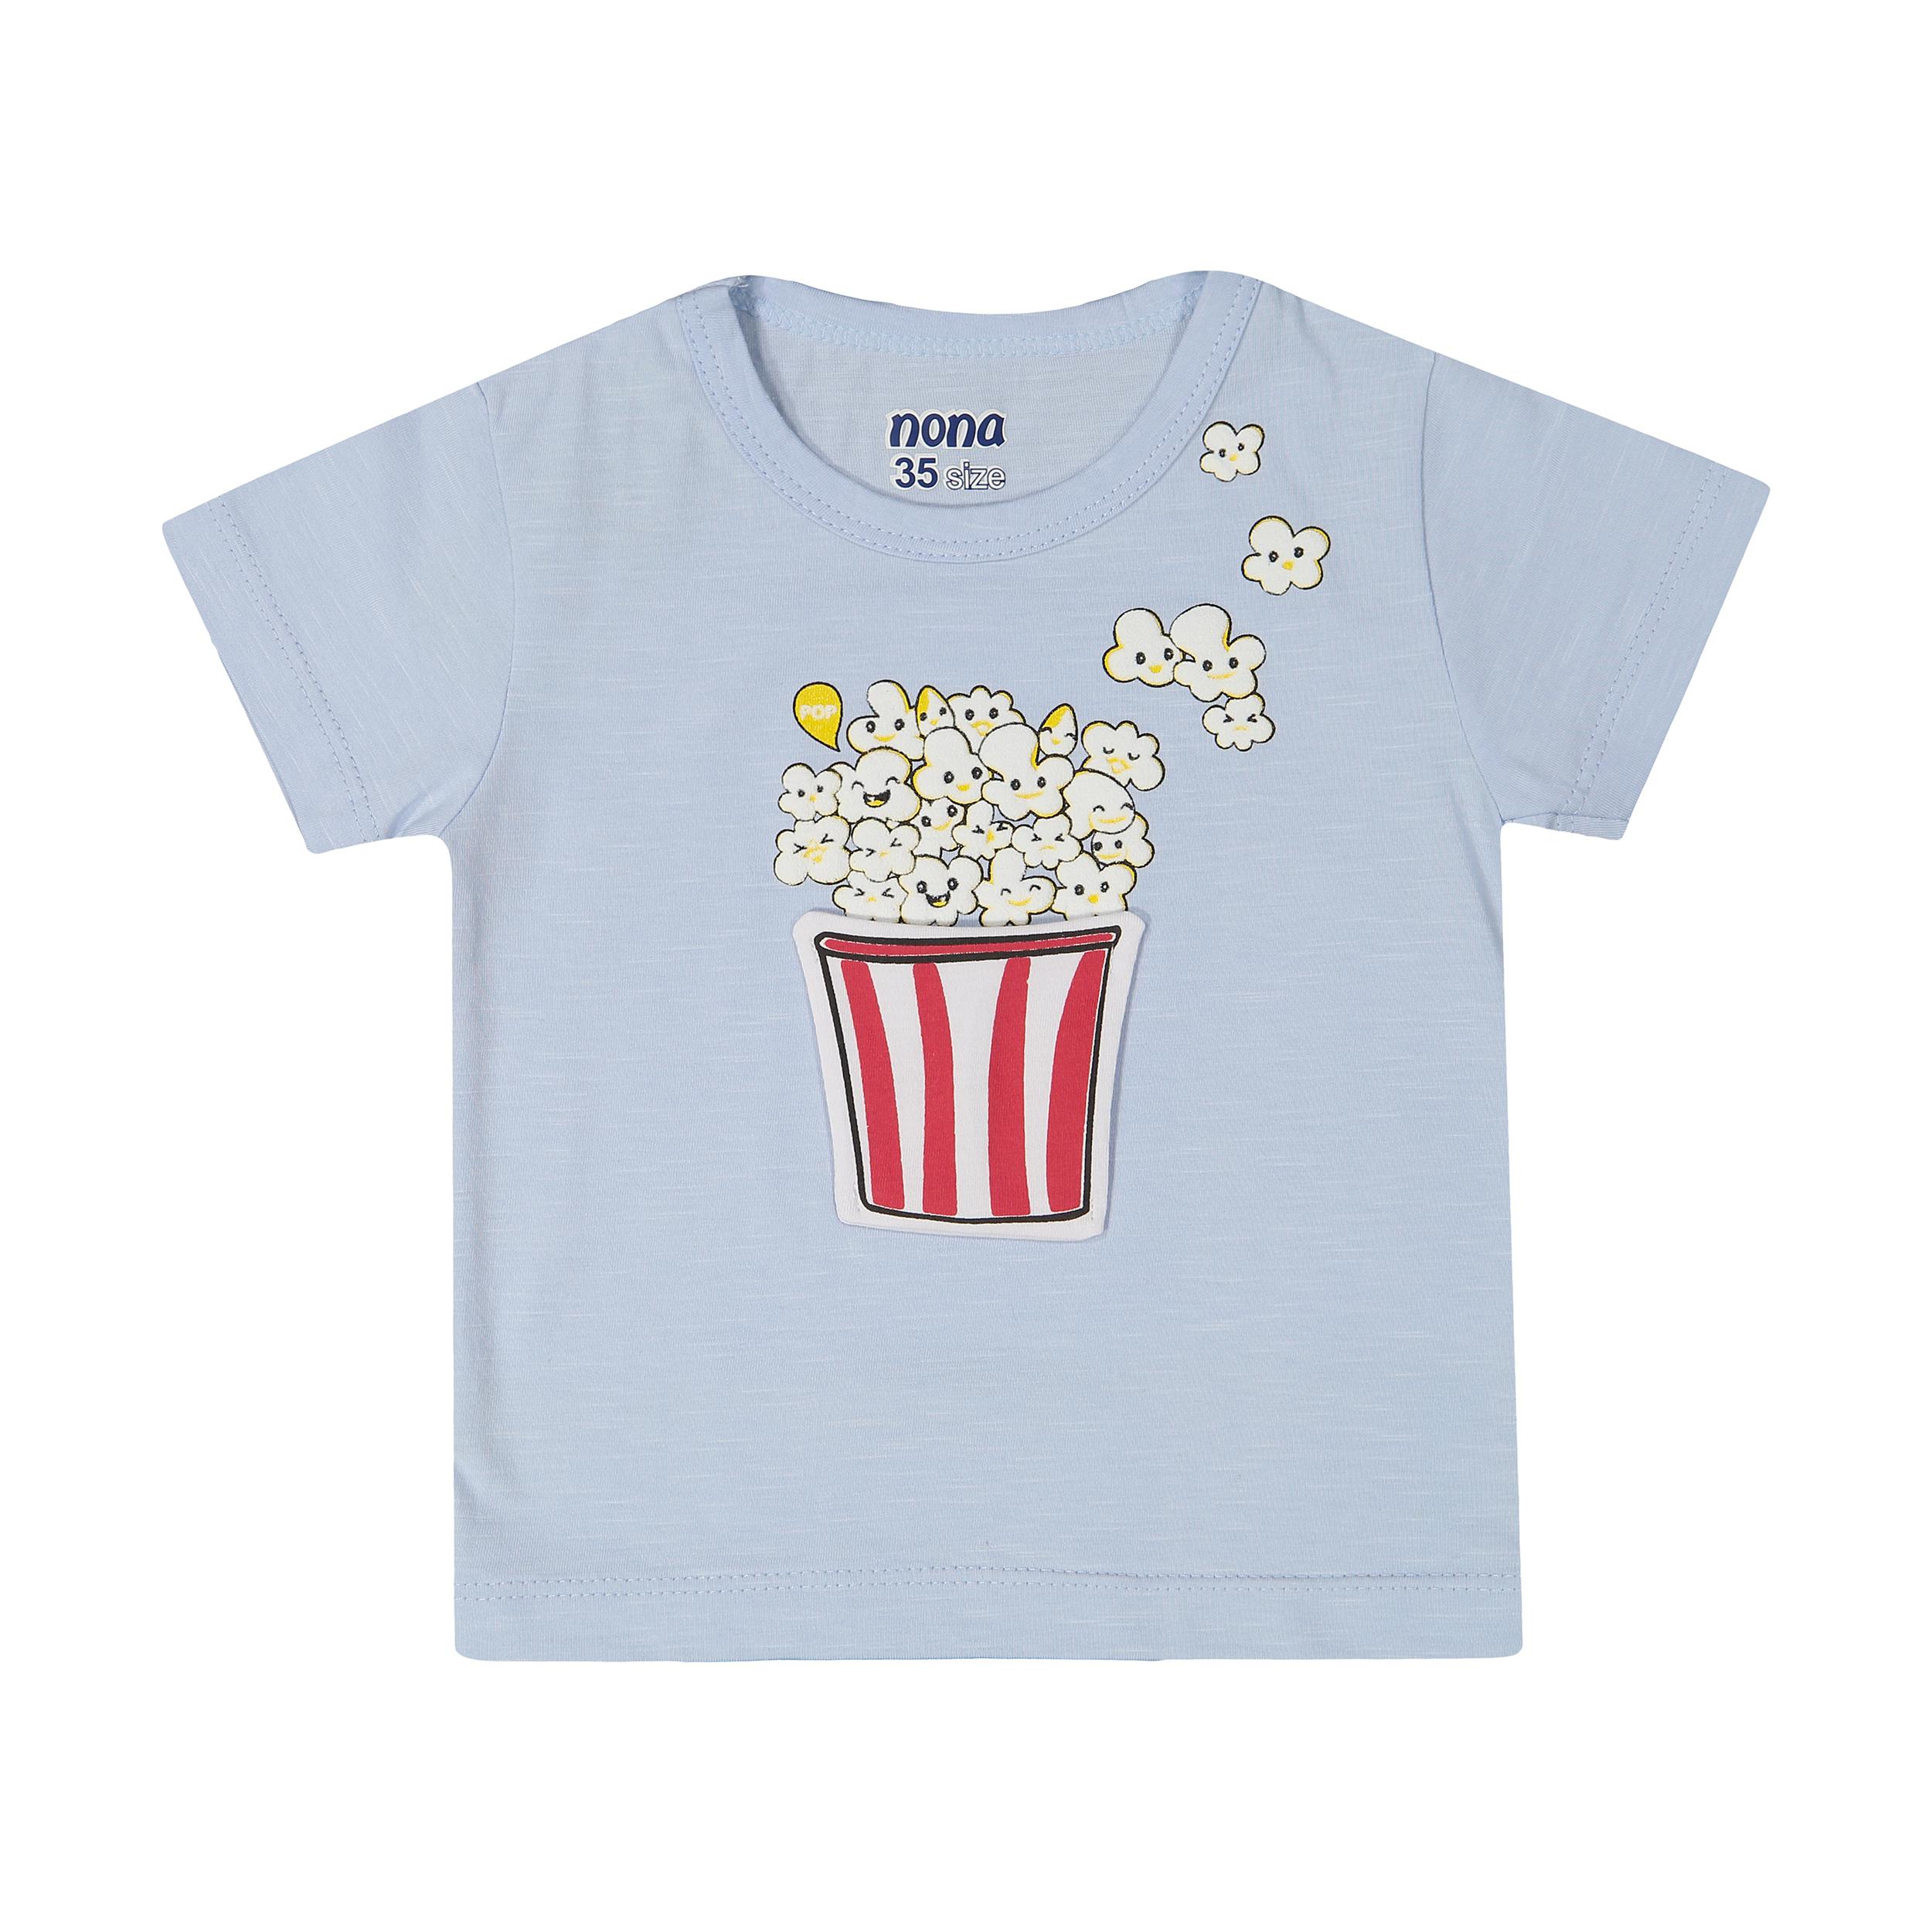 تی شرت پسرانه نونا مدل 2211116-51